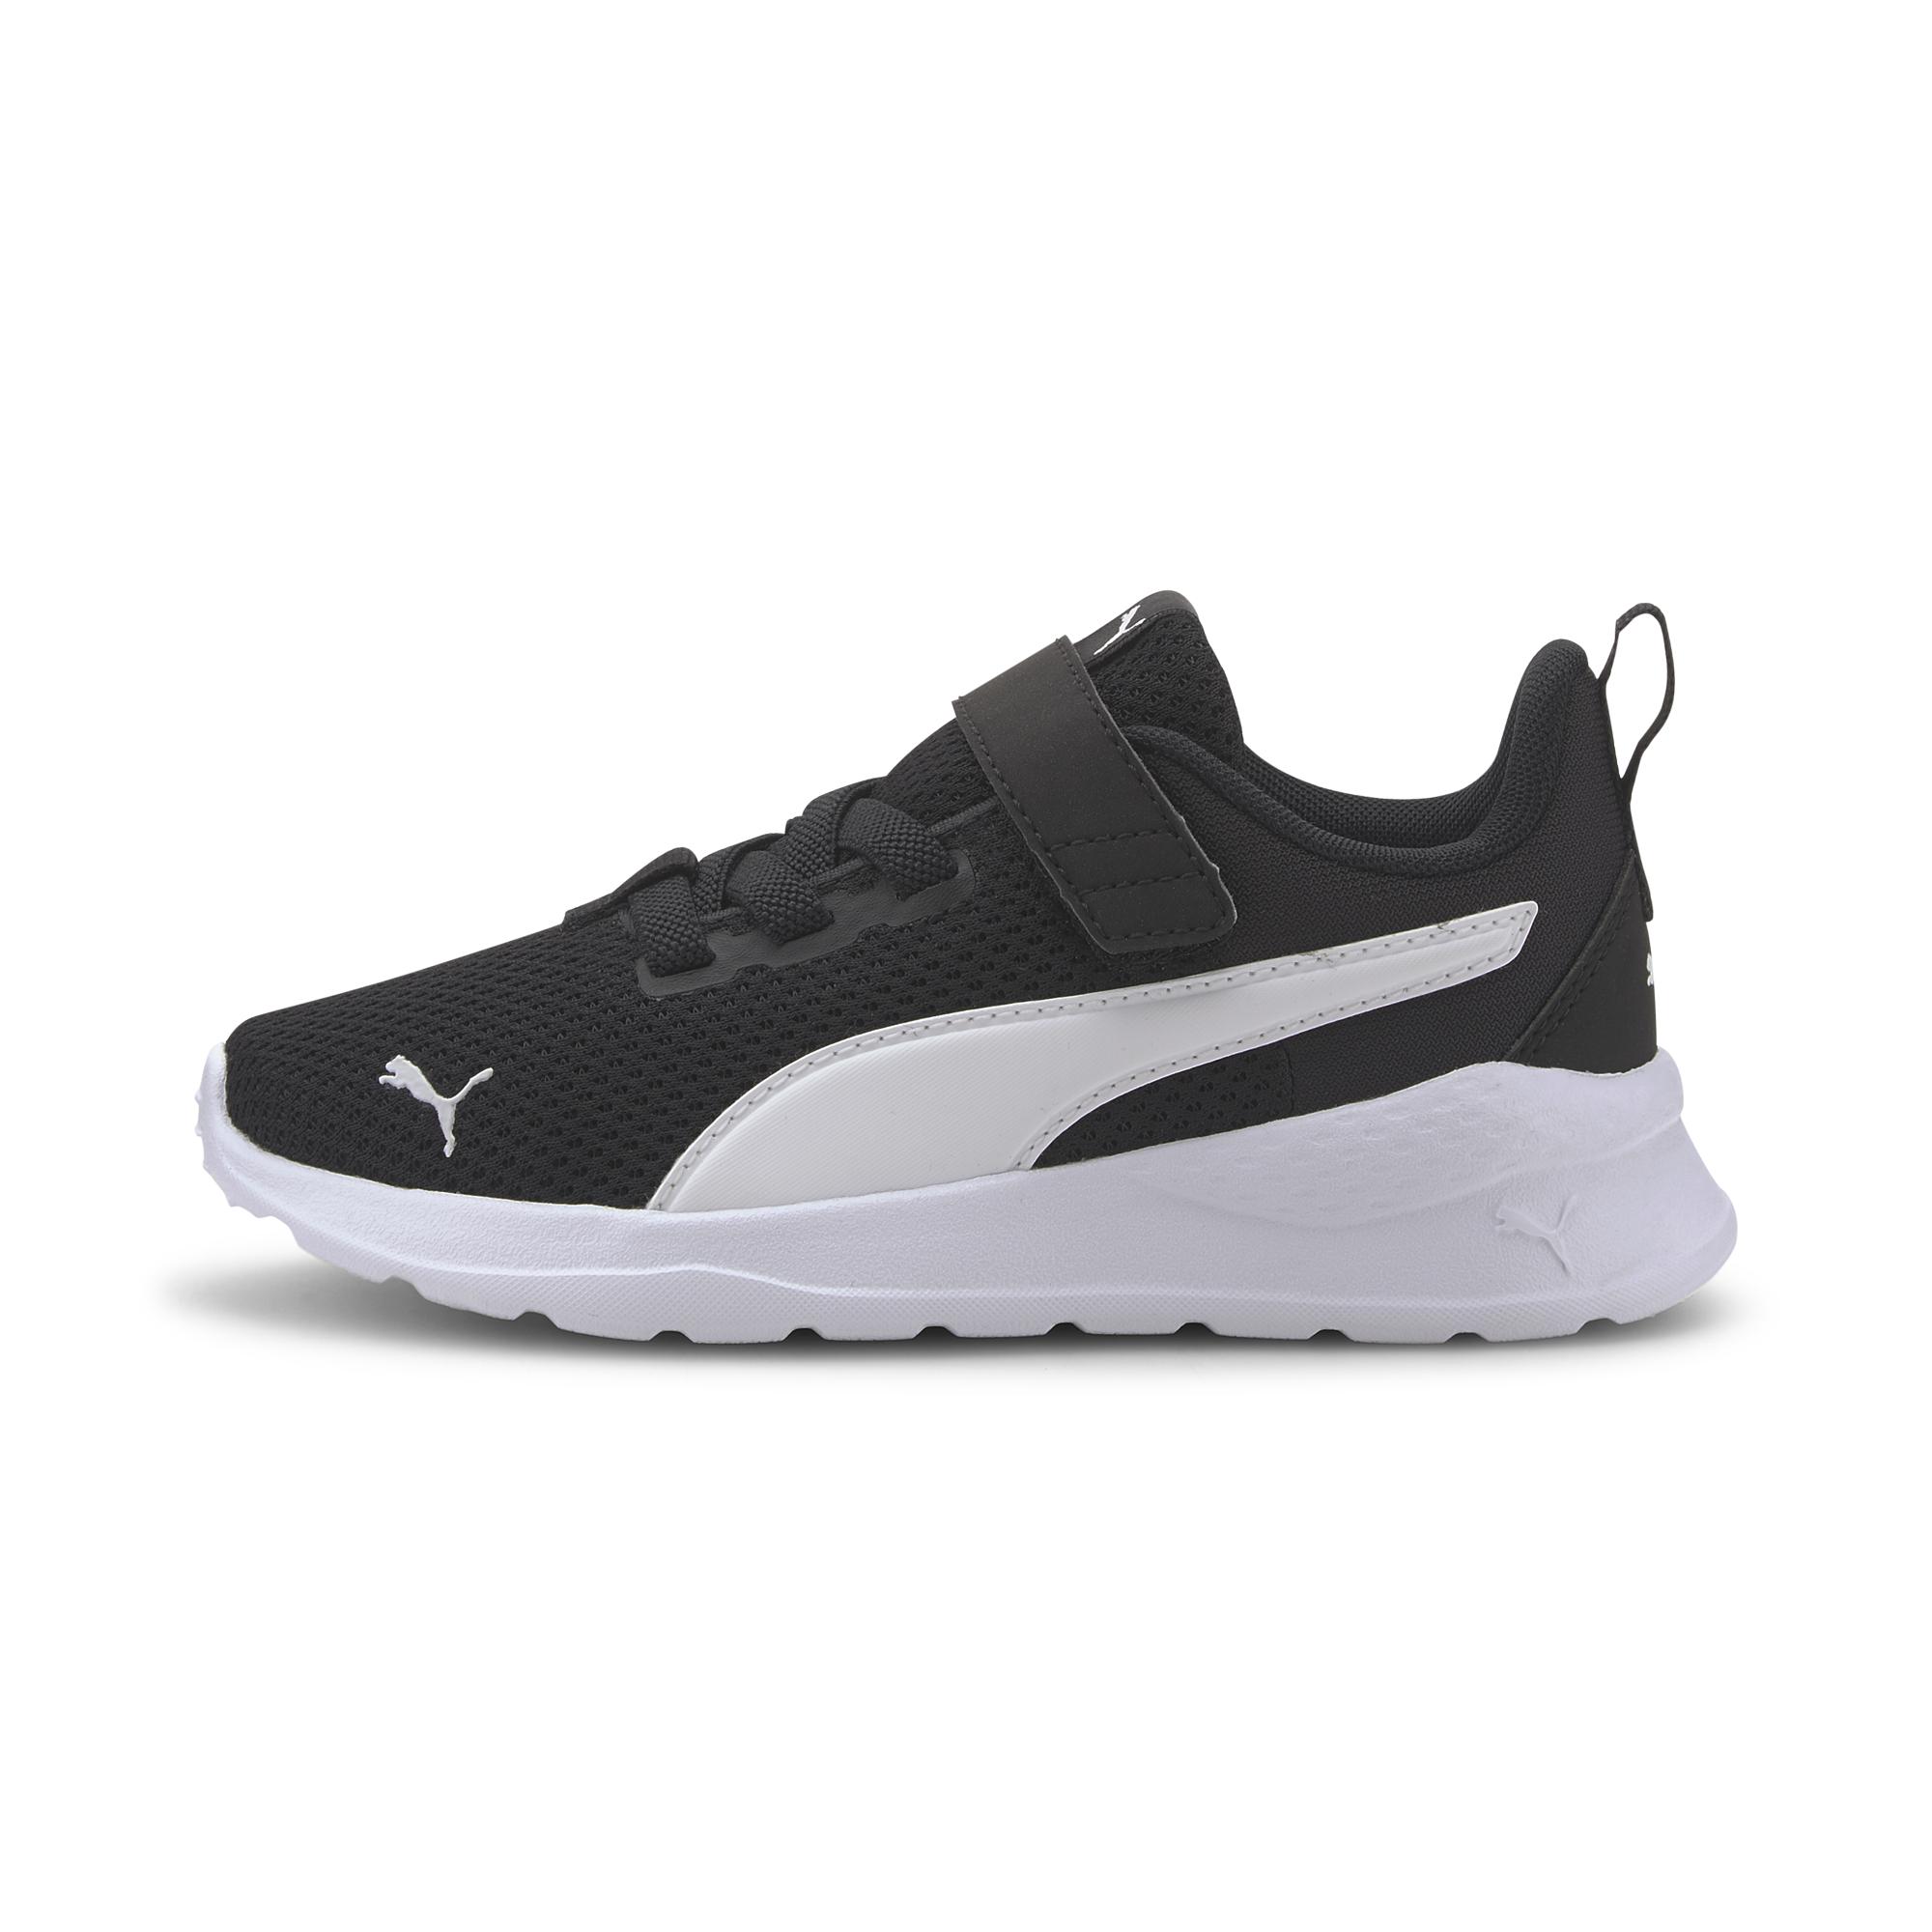 Puma Anzarun Lite kids sneakers, black-white, 30